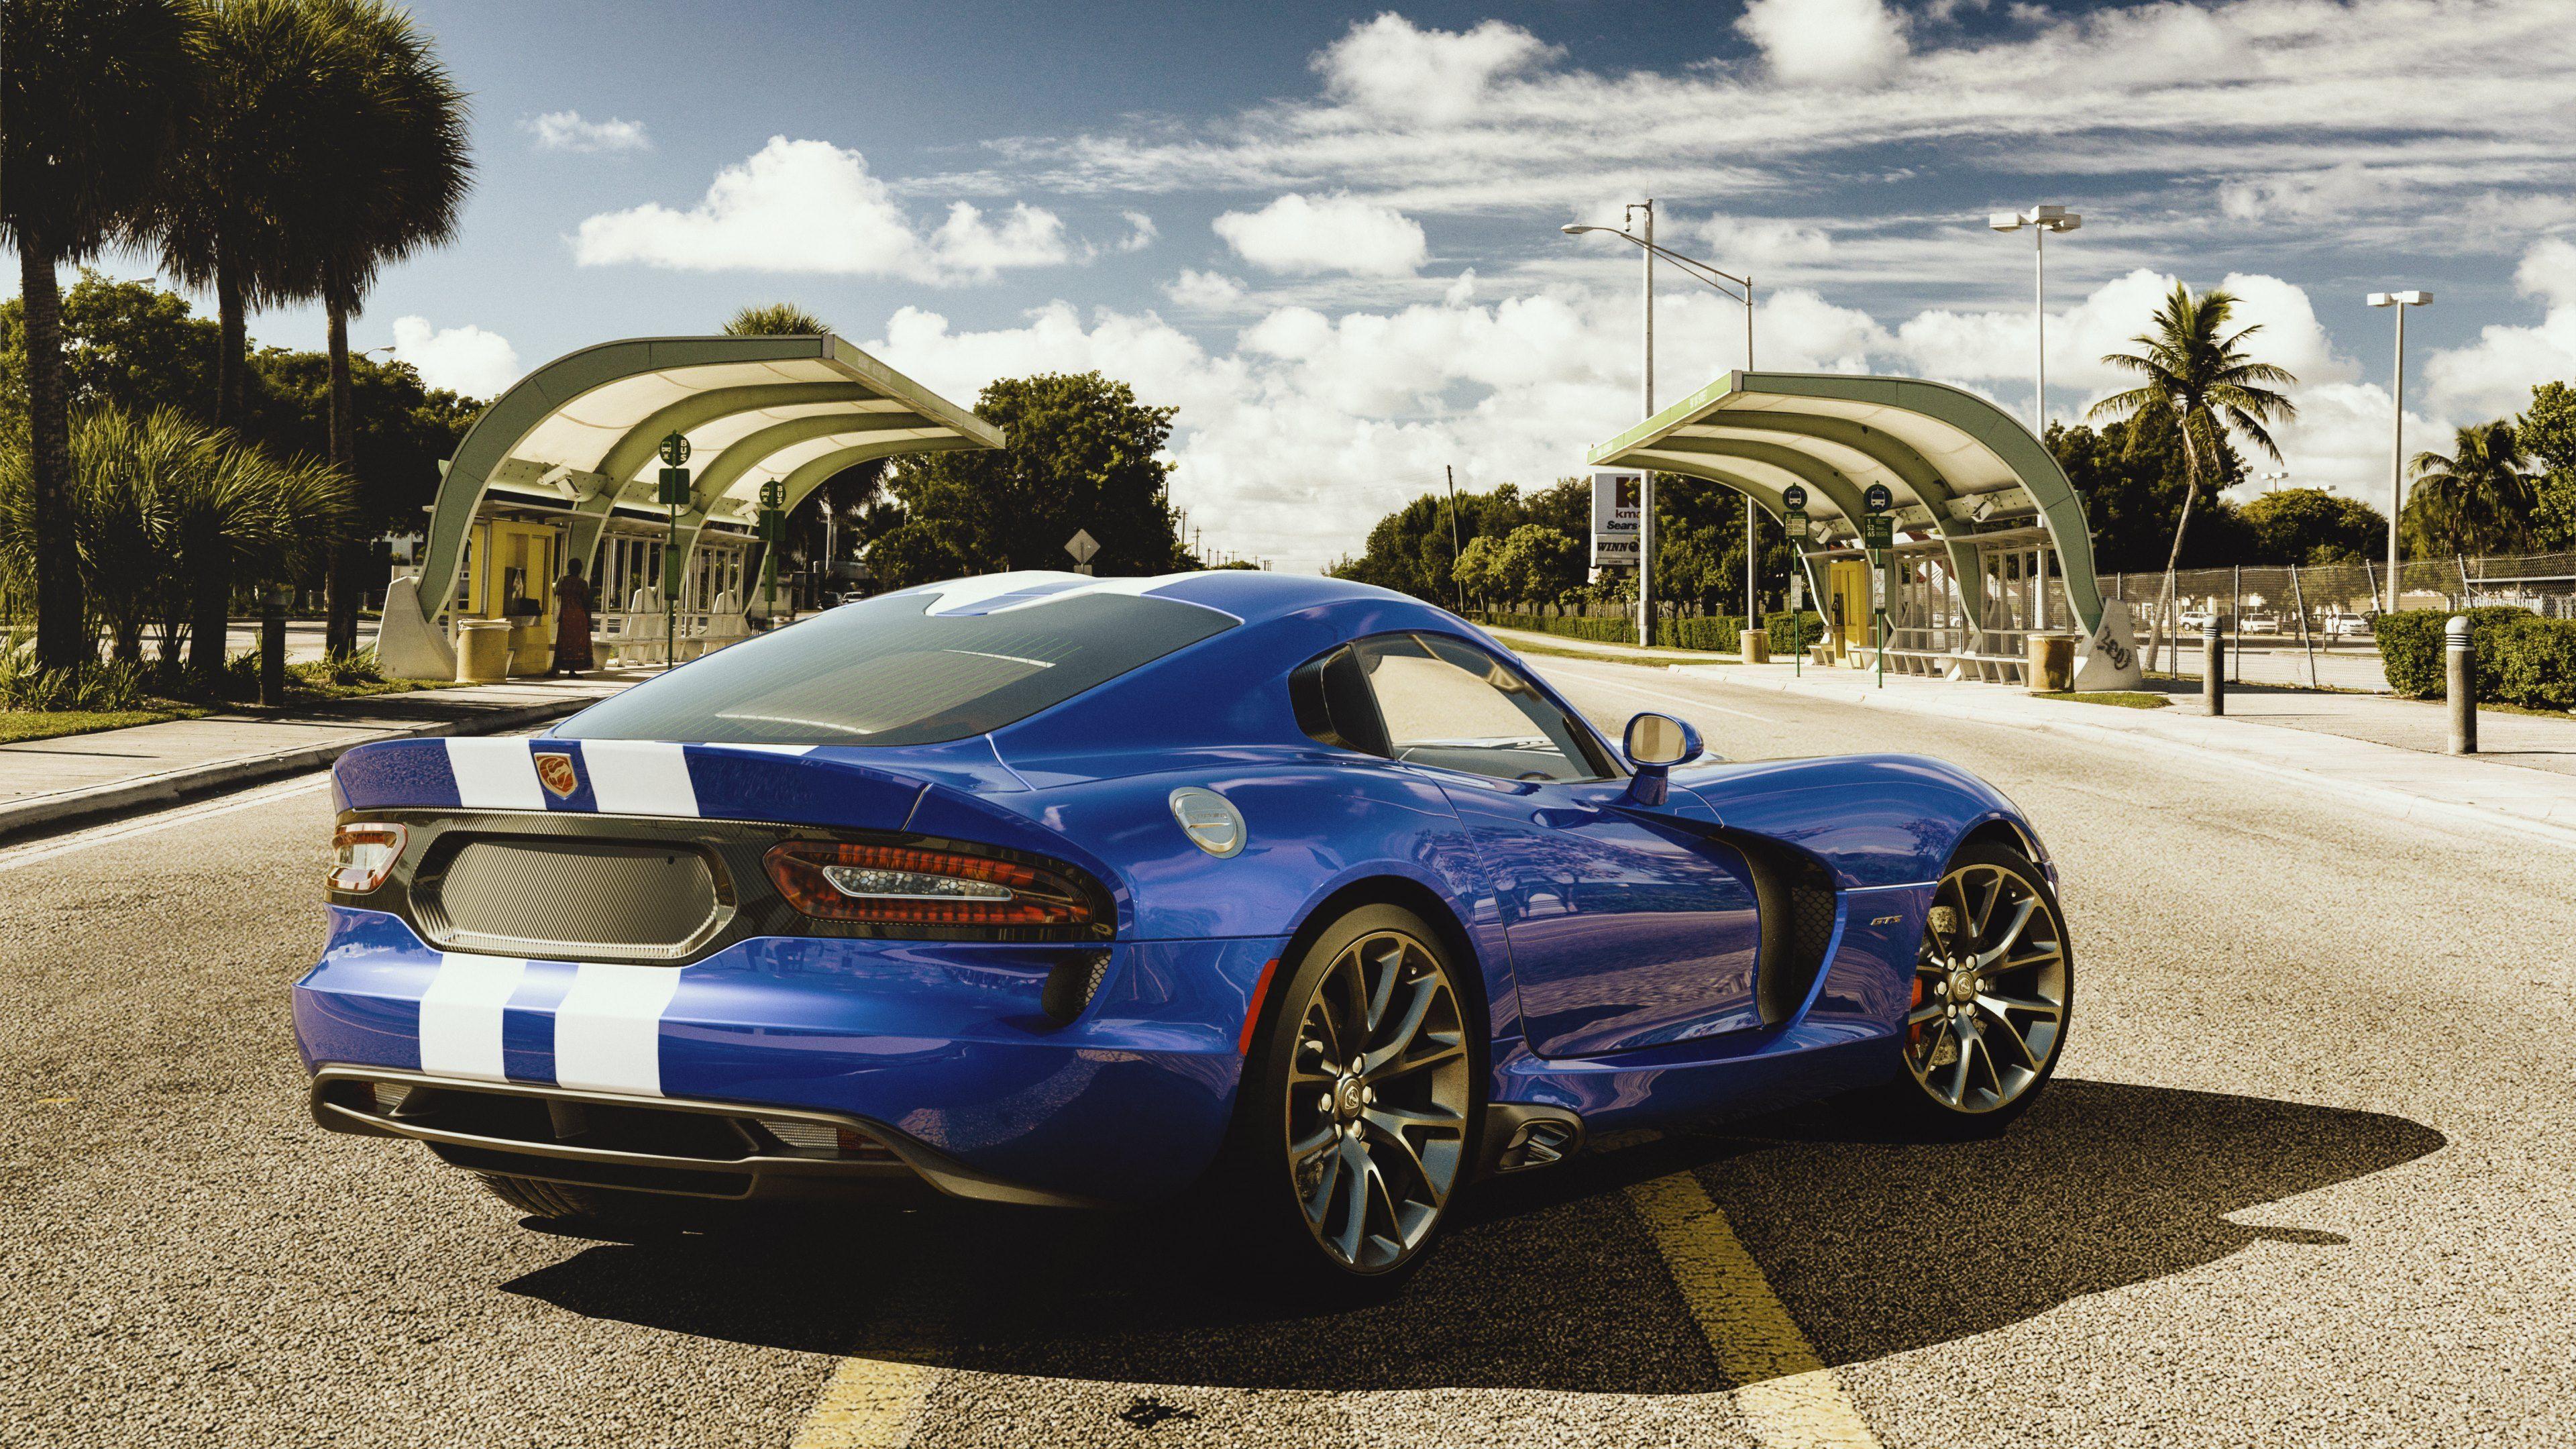 Ultra Wide 4K Car Wallpapers - Top Free Ultra Wide 4K Car ...